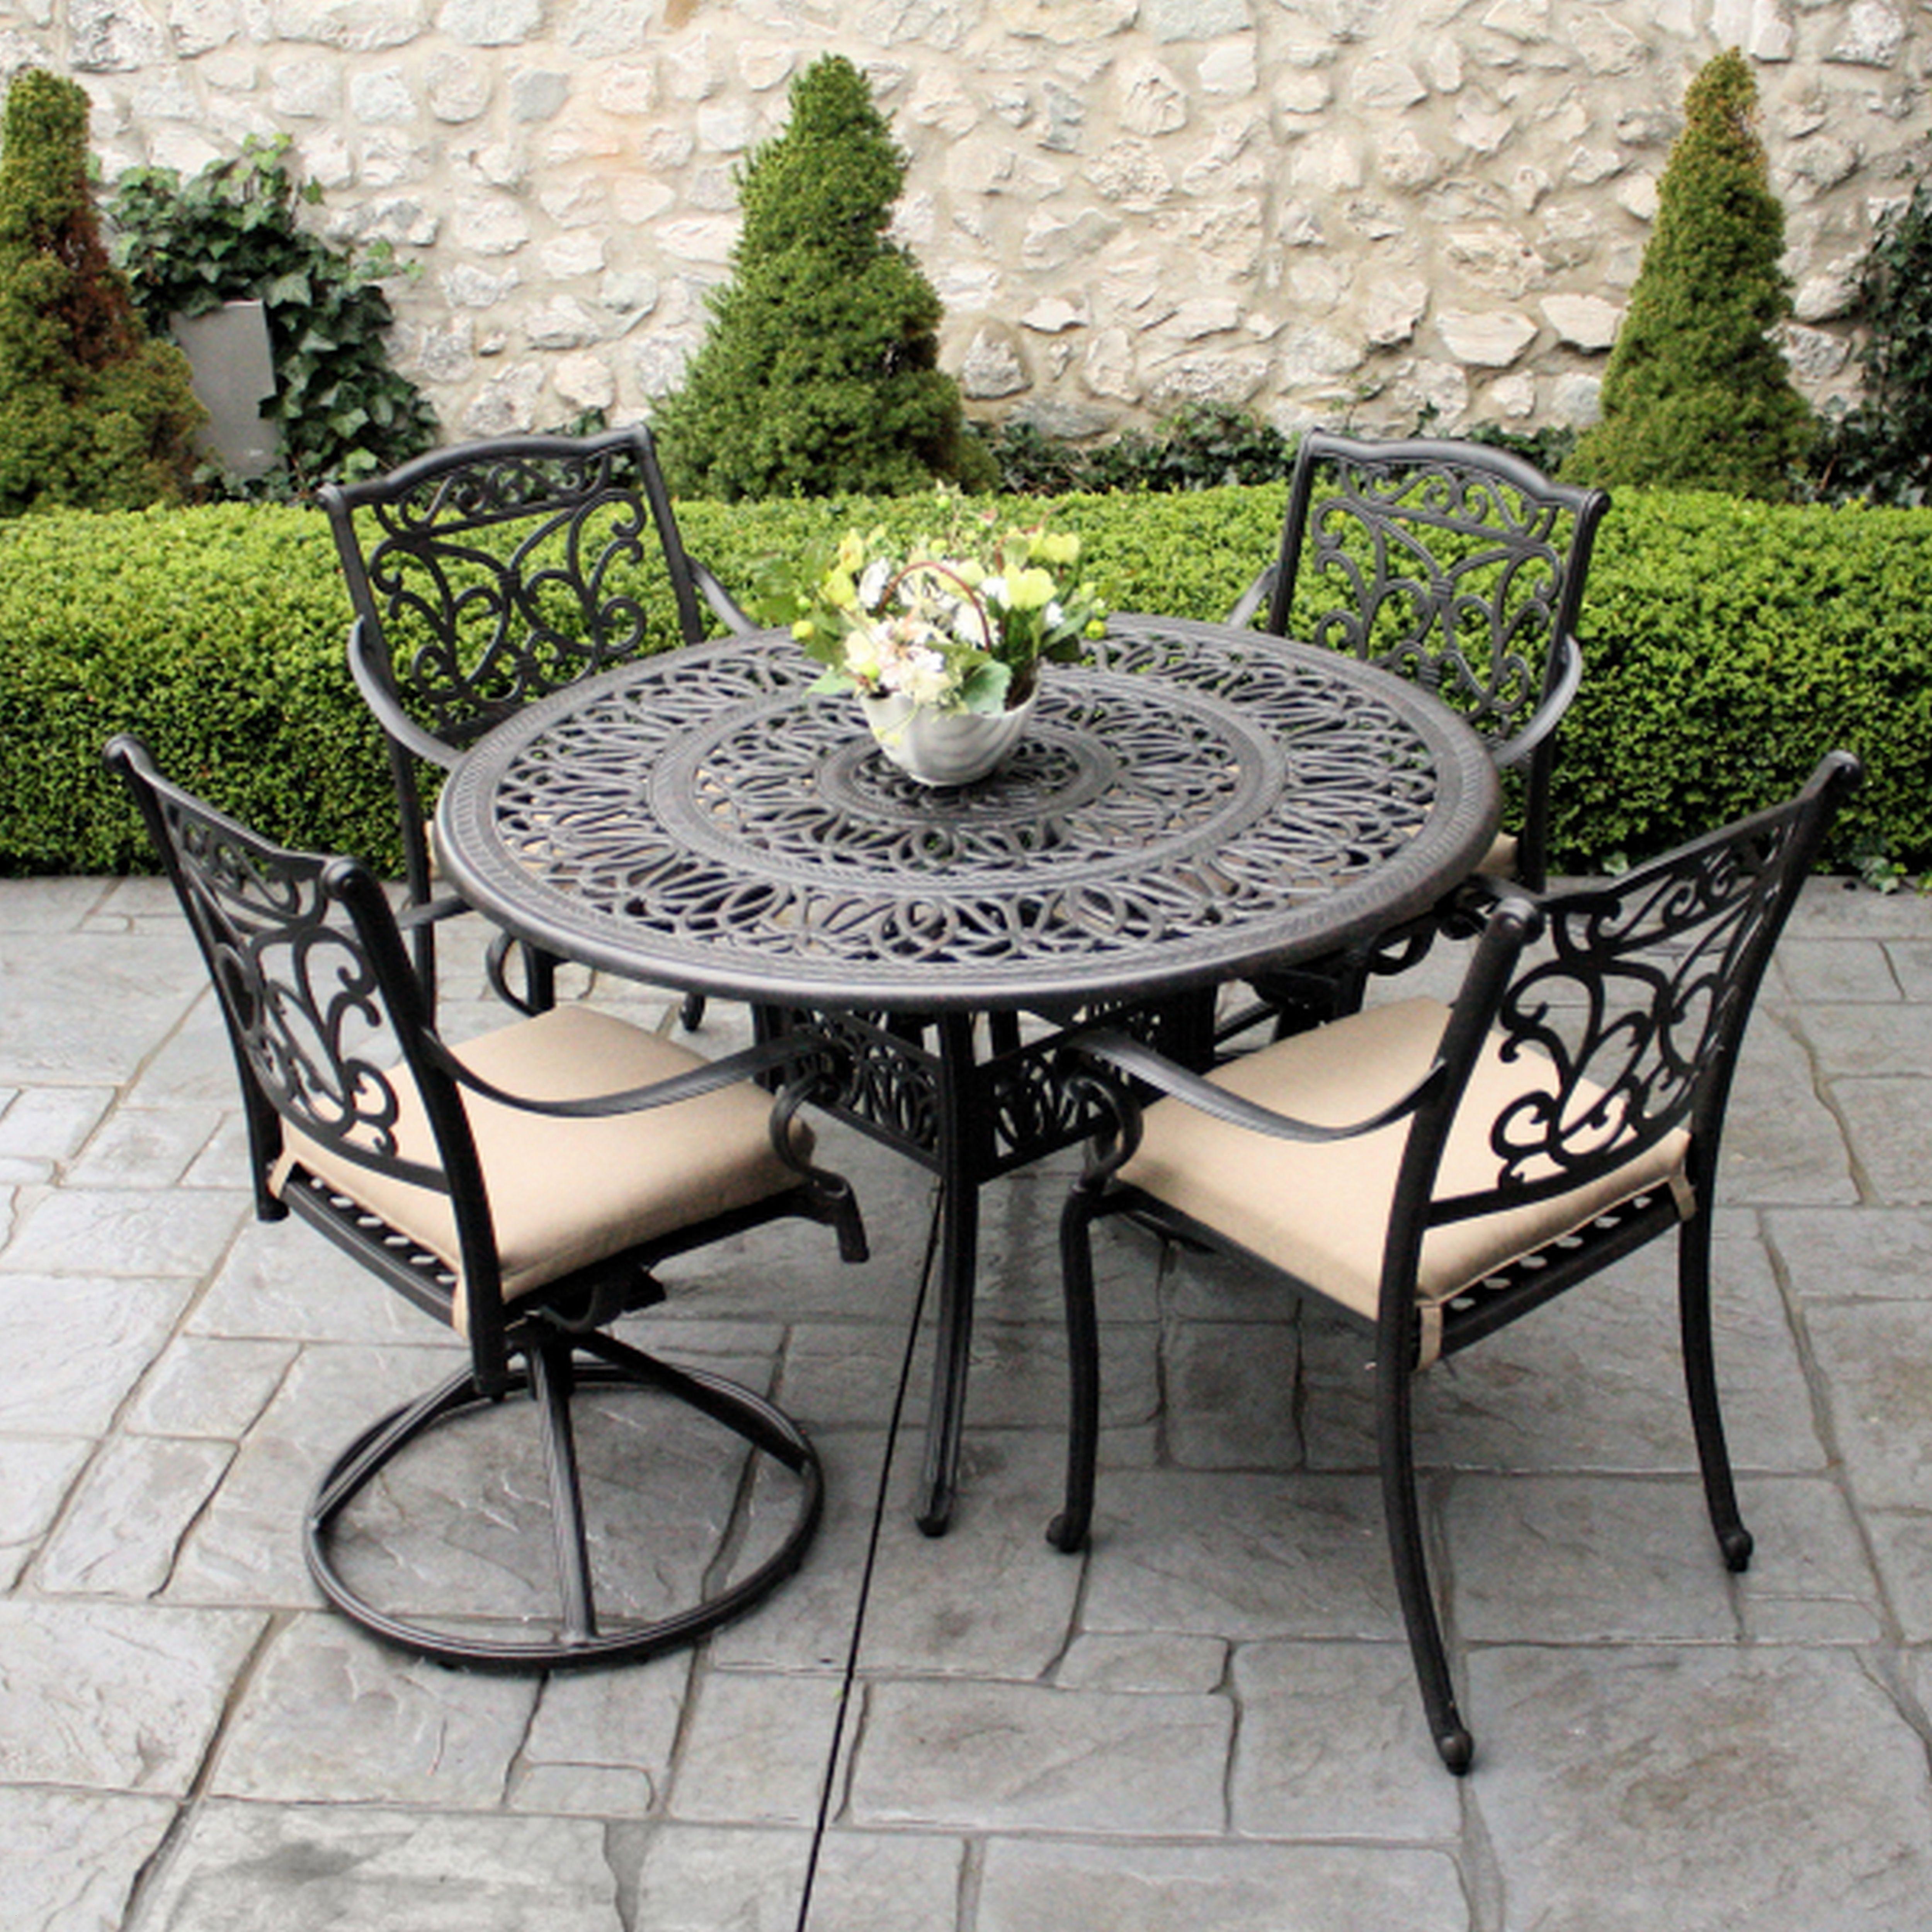 27 Einzigartige Guss Sofa Sofamodelle Info Eisen Gartenmobel Outdoor Dekorationen Terrassen Stuhle